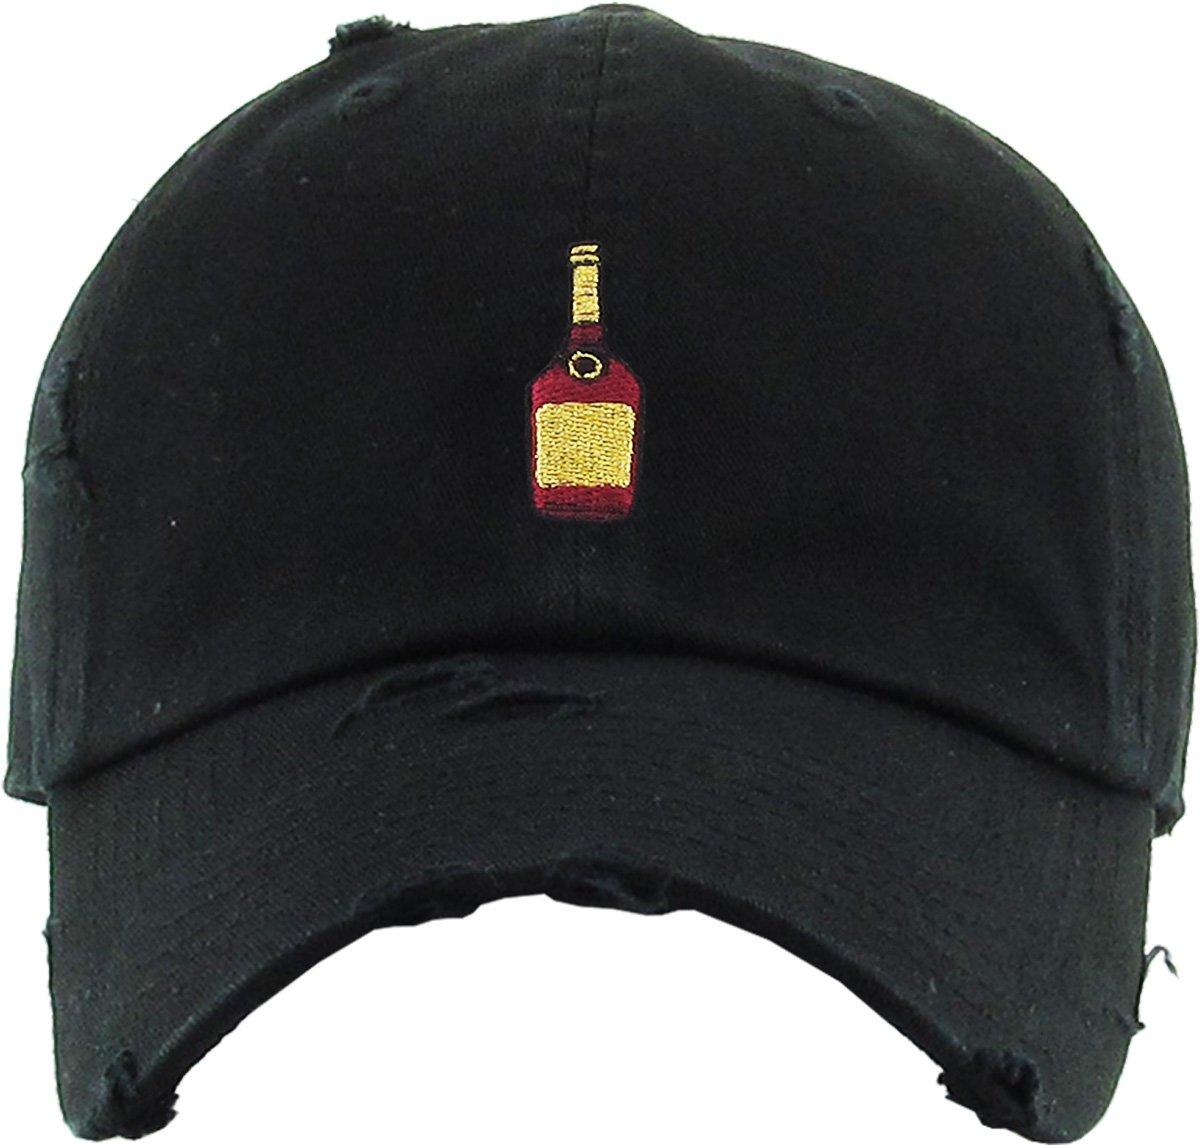 259d1947ebb Amazon.com  KBSV-047 BLK Henny Bottle Vintage Distressed Dad Hat Baseball  Cap Polo Style Adjustable  Sports   Outdoors